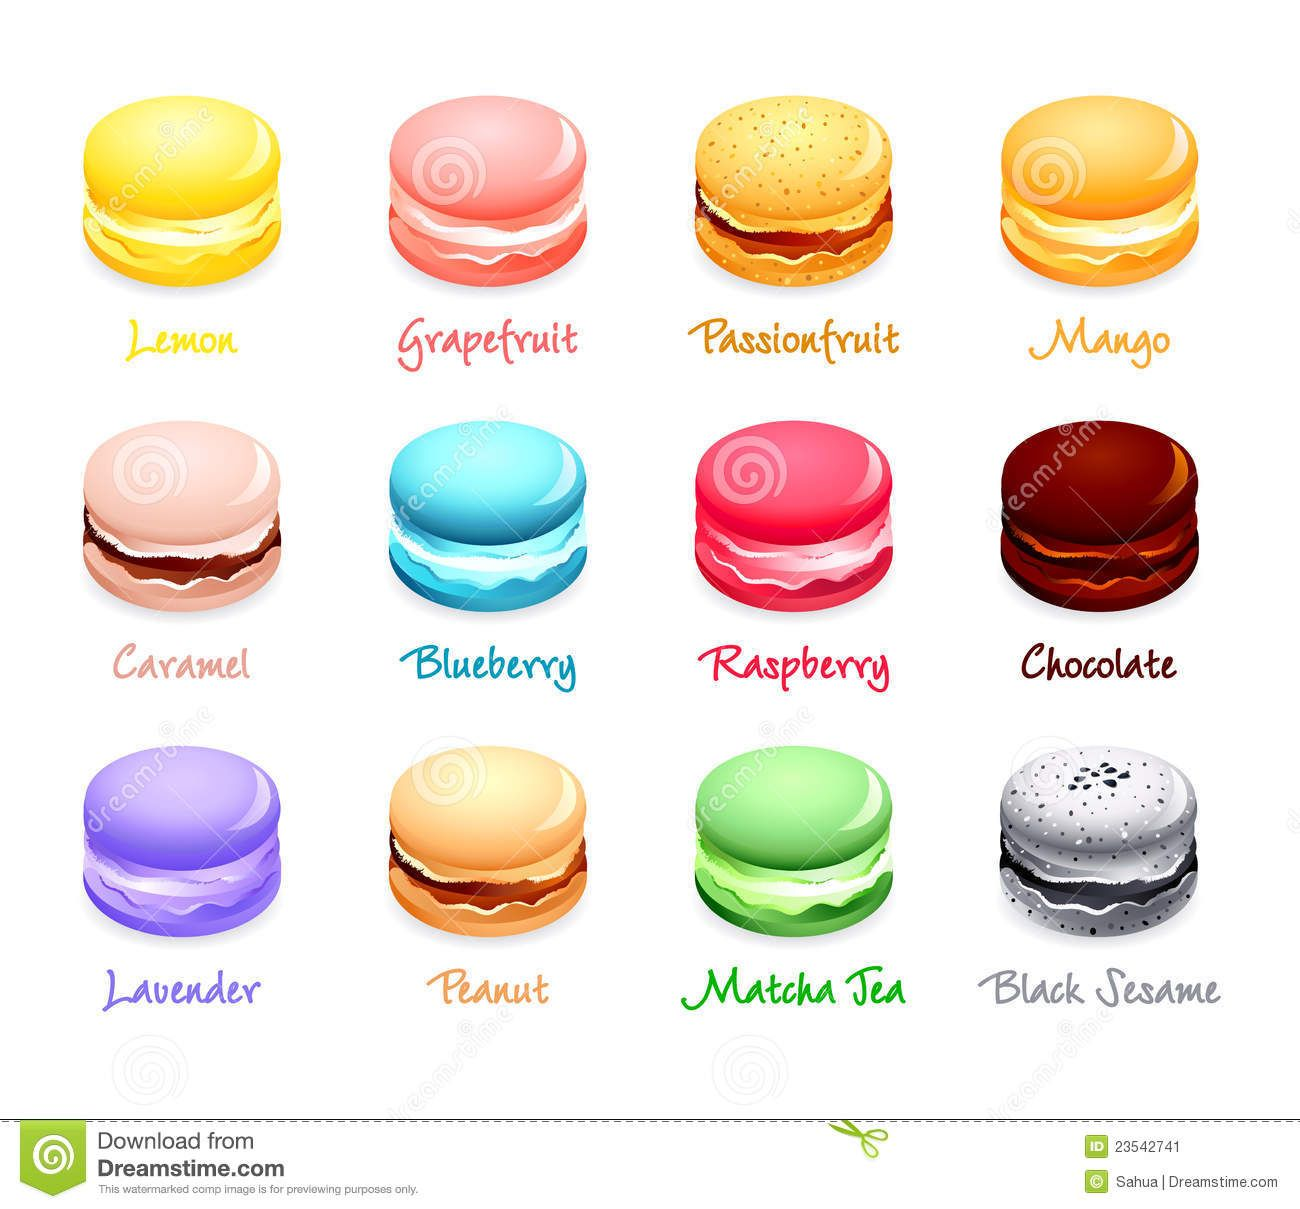 Macaron-flavors-23542741.jpg (1300×1209)